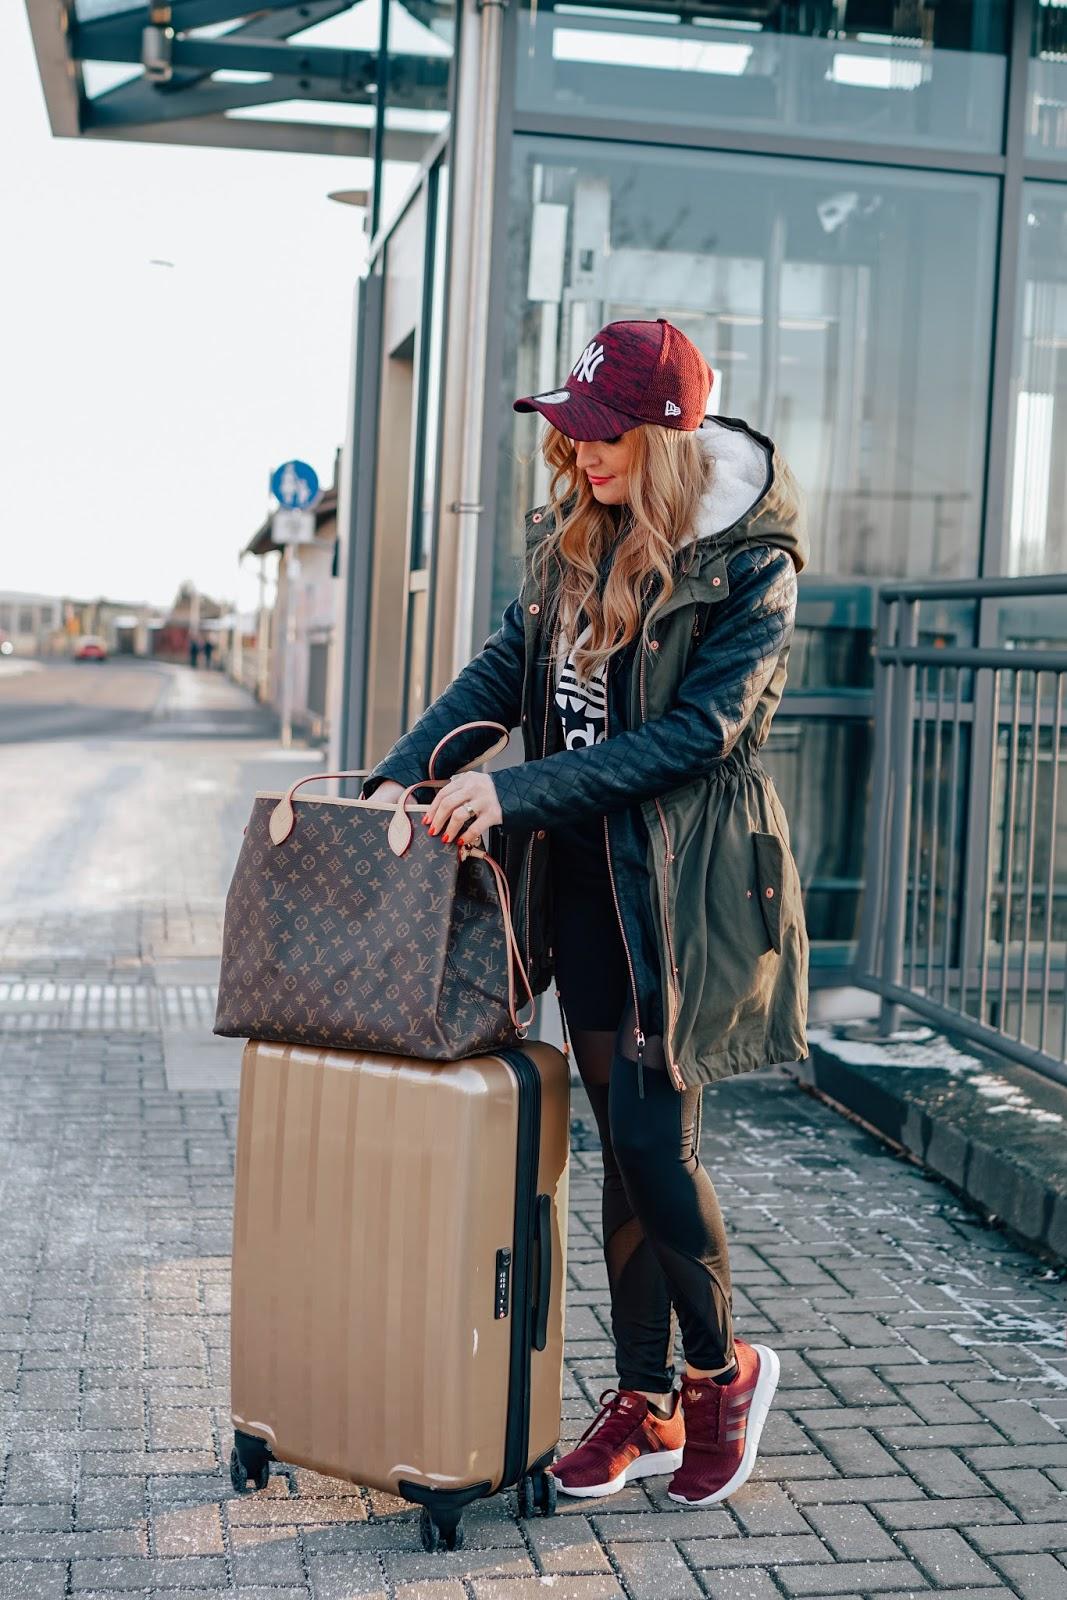 Lidl-koffer-Louis-vuitton-tasche-gm-neverful-was-zieht-man-zu-einem-langen-flug-an-defshop-lässiger-look-casual-sporty-fashionblogger-aus-deutschland-deutsche-fashionblogger-fashionstylebyjohanna